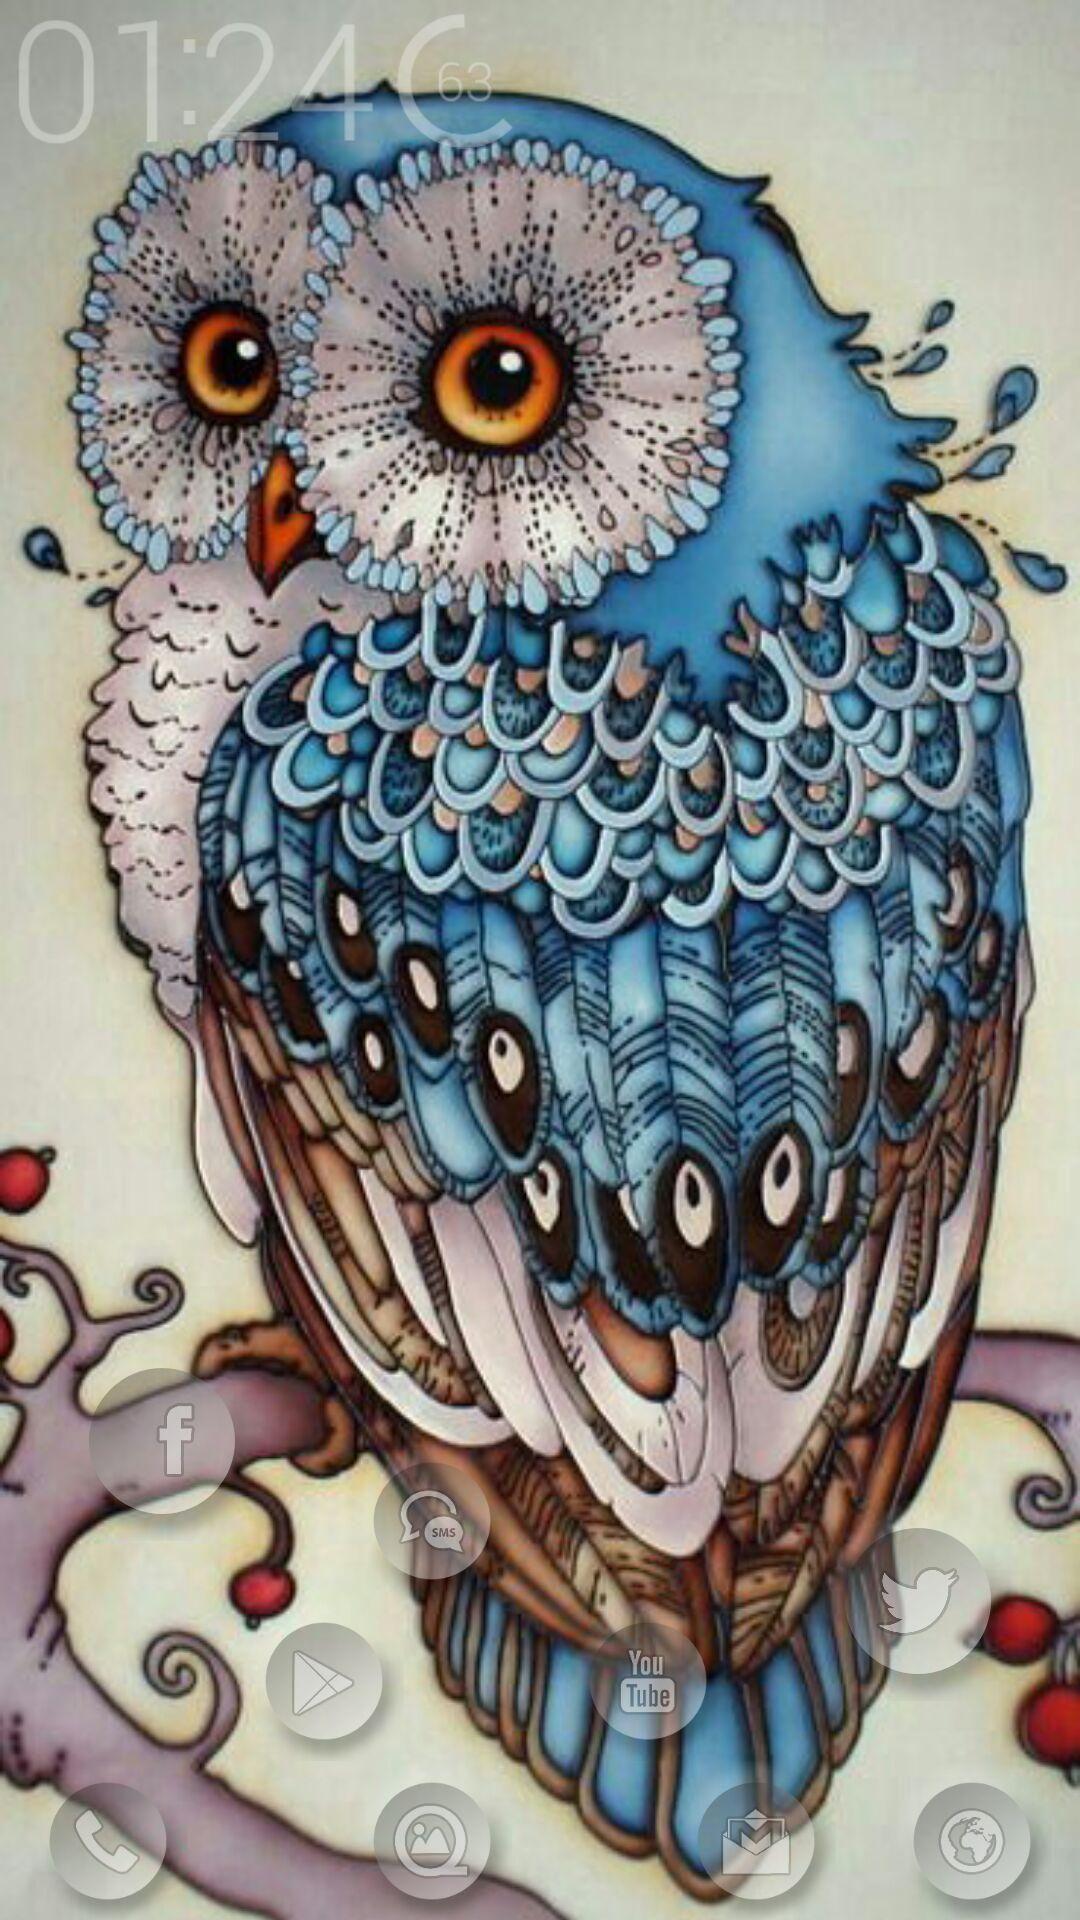 Pin by karini q on art quilts pinterest owl art owl and art